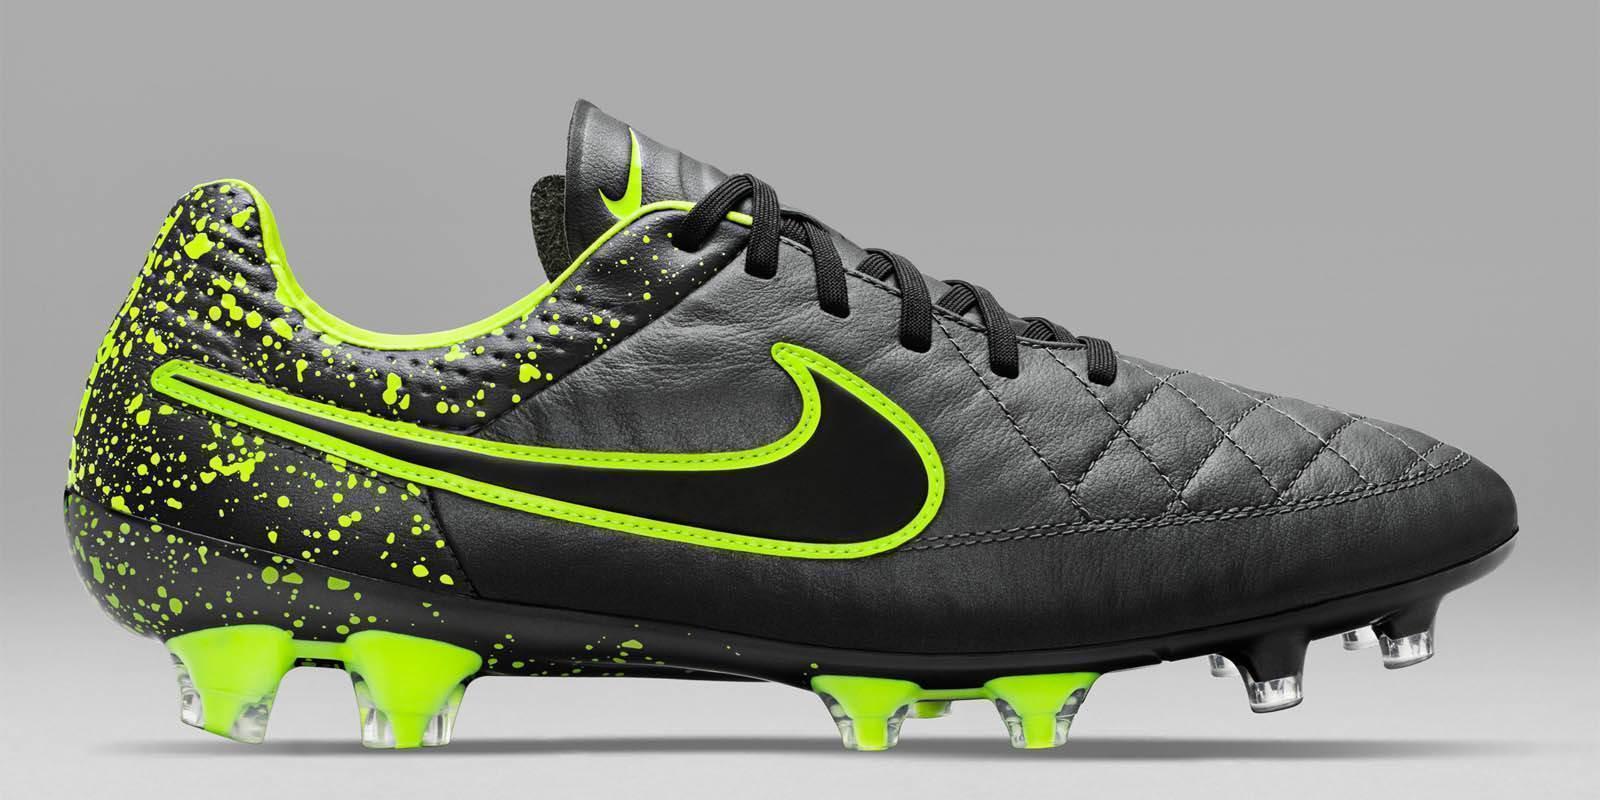 FIFA 16 Nike Tiempo VI CoastalBlue boots » FIFA 20, FIFA 19